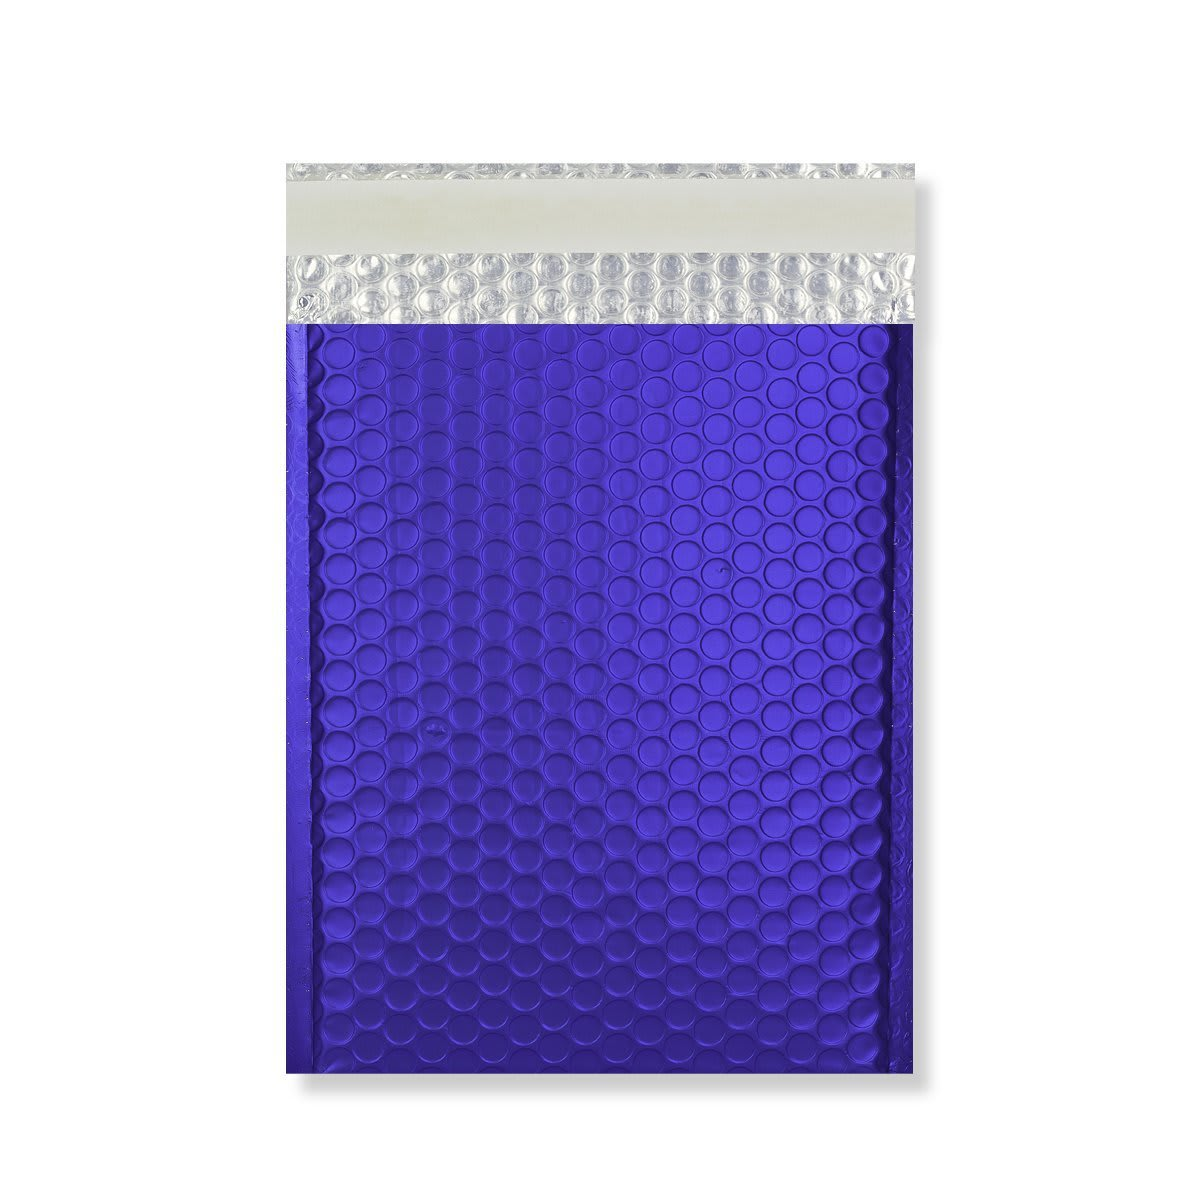 C4 MATT METALLIC DARK BLUE PADDED ENVELOPES (324 x 230MM)